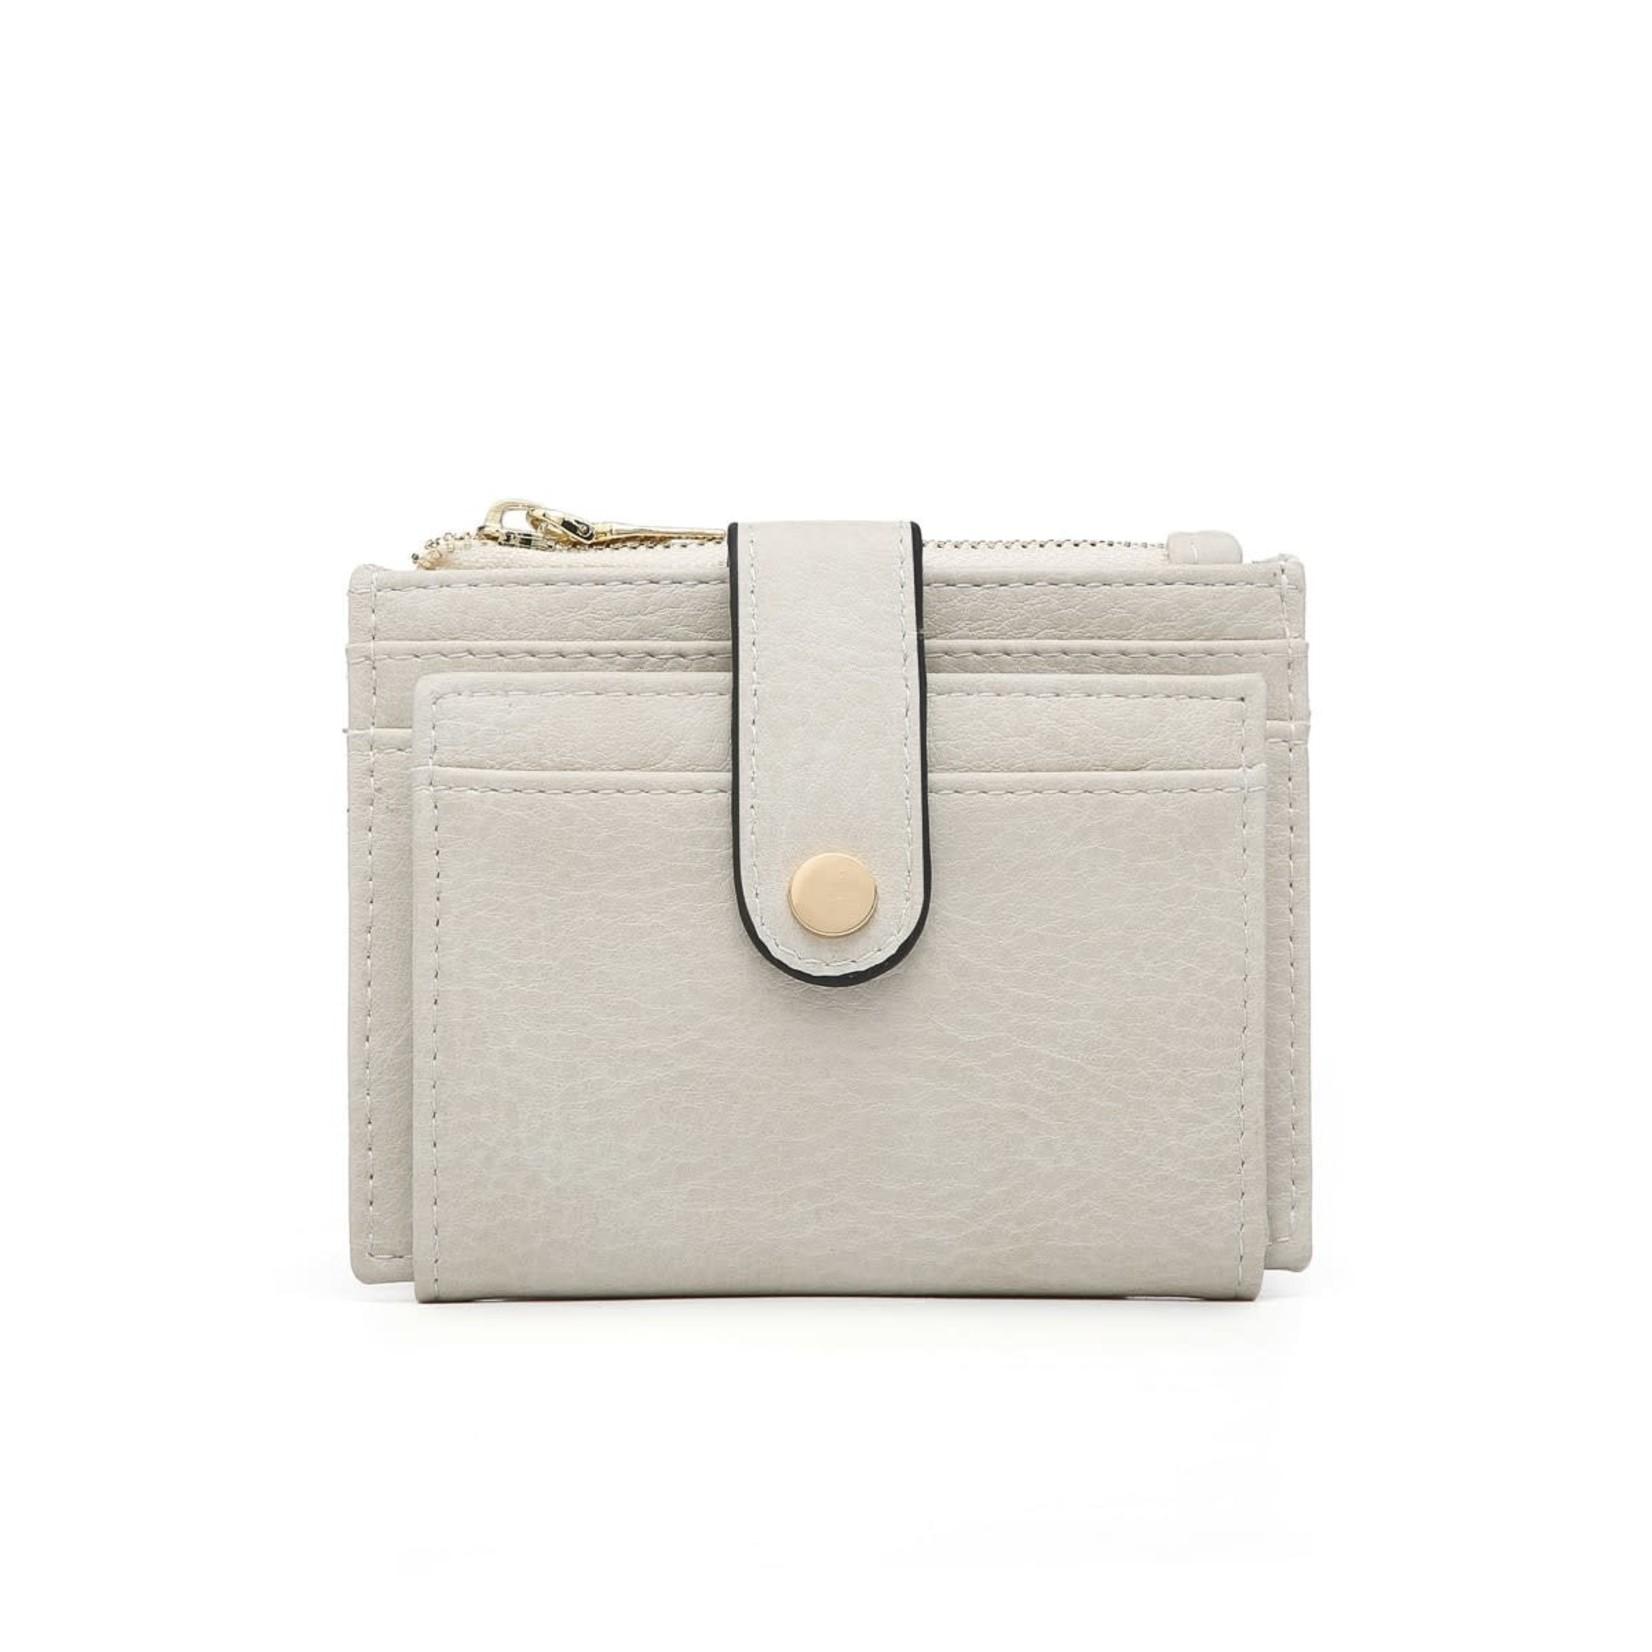 Off White Wallet/Credit Card Holder in Vegan Leather